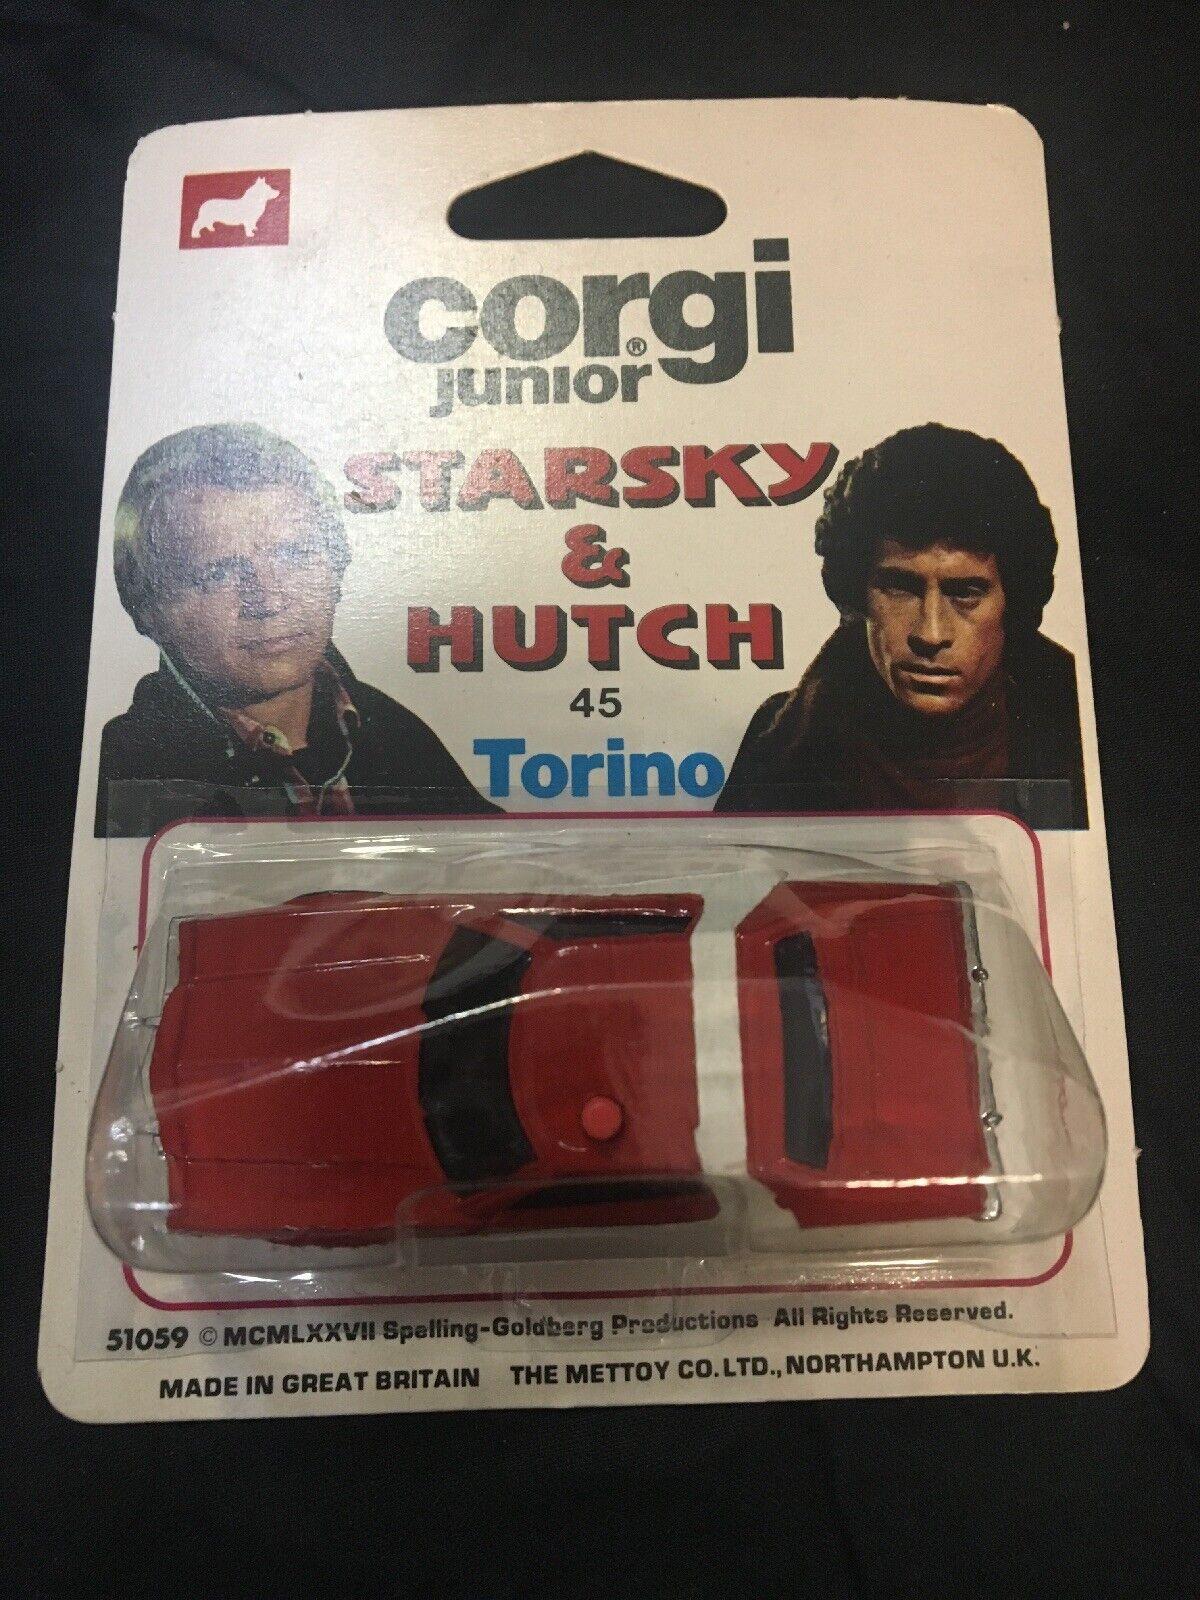 1976 CORGI JUNIOR STARSKY & HUTCH  45 TORINO MOC GREAT BRITIAN GERMAN STAMPED